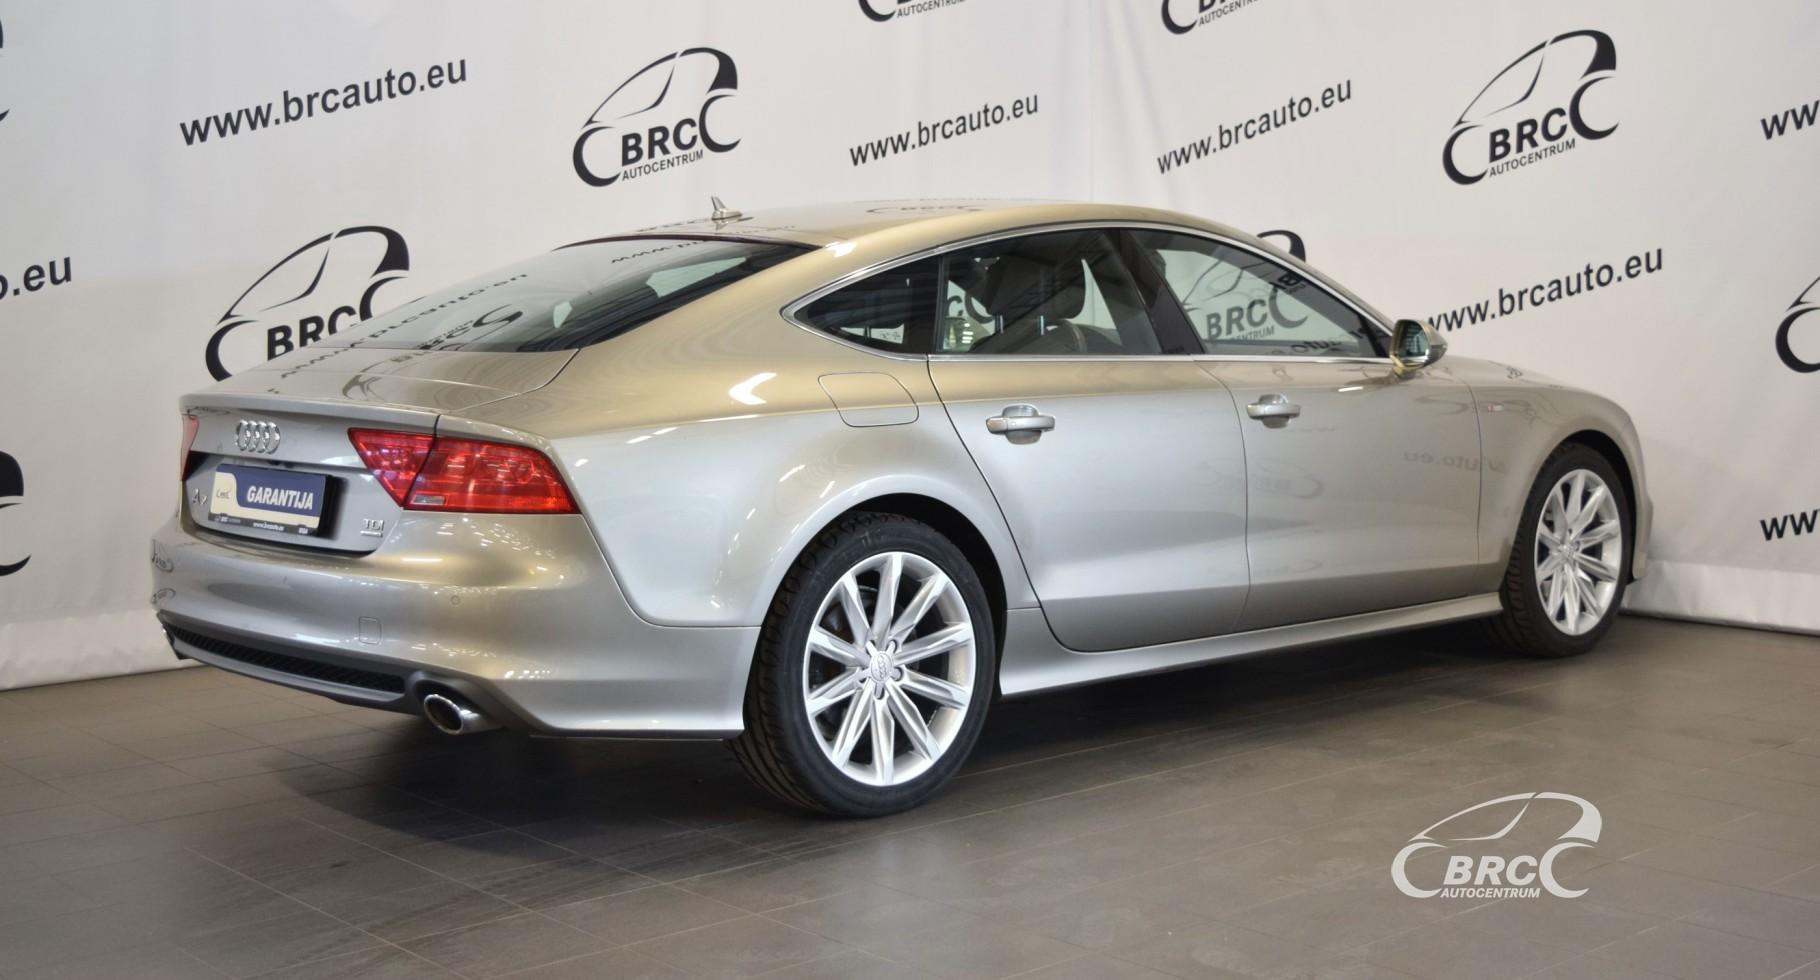 Audi A7 Sportback S-Line TDi Quattro